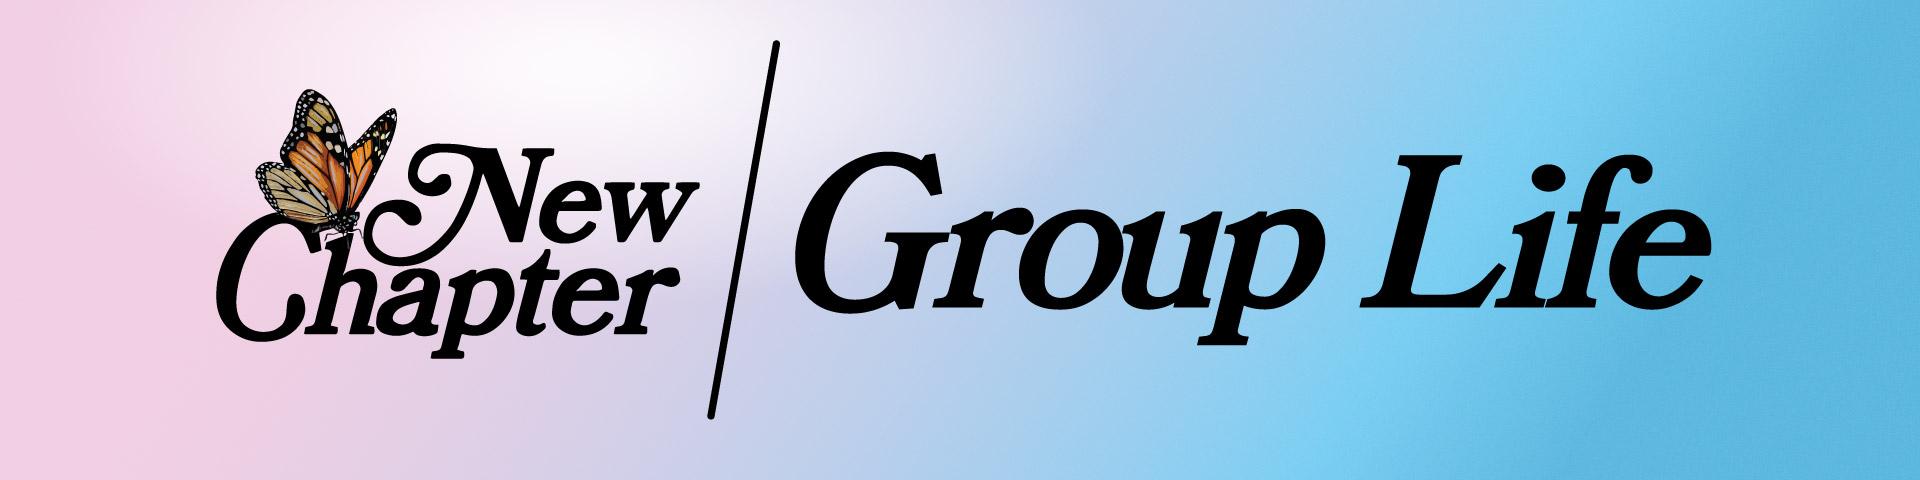 homepage-banners-grouplife-2